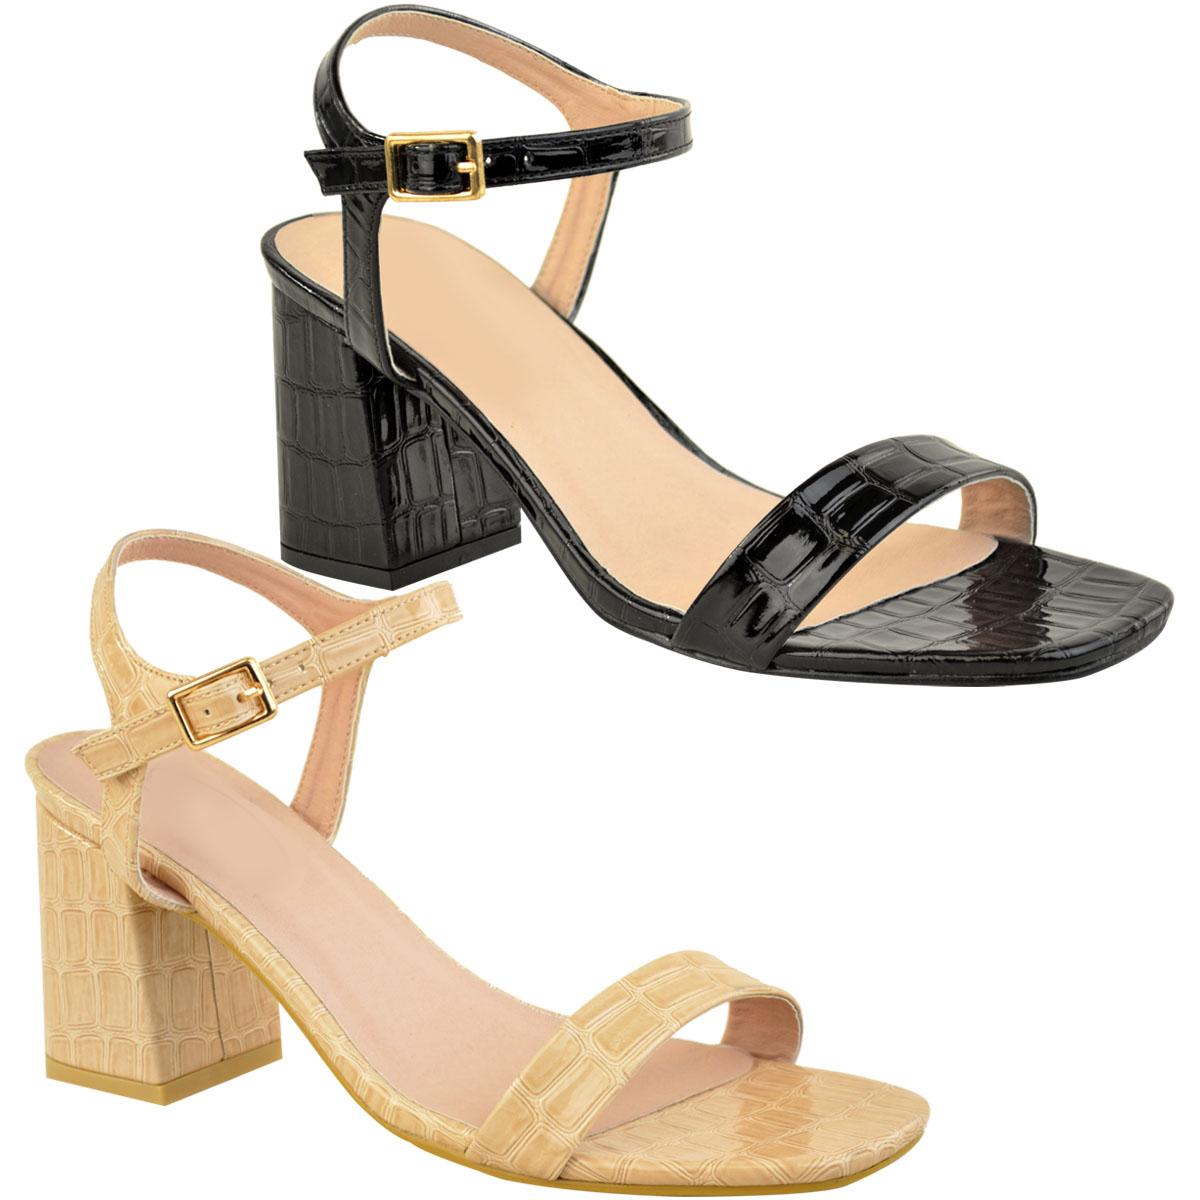 NEW Women Low Mid Heel Sandals Ankle Buckle Ladies Smart Slingback Summer Shoes